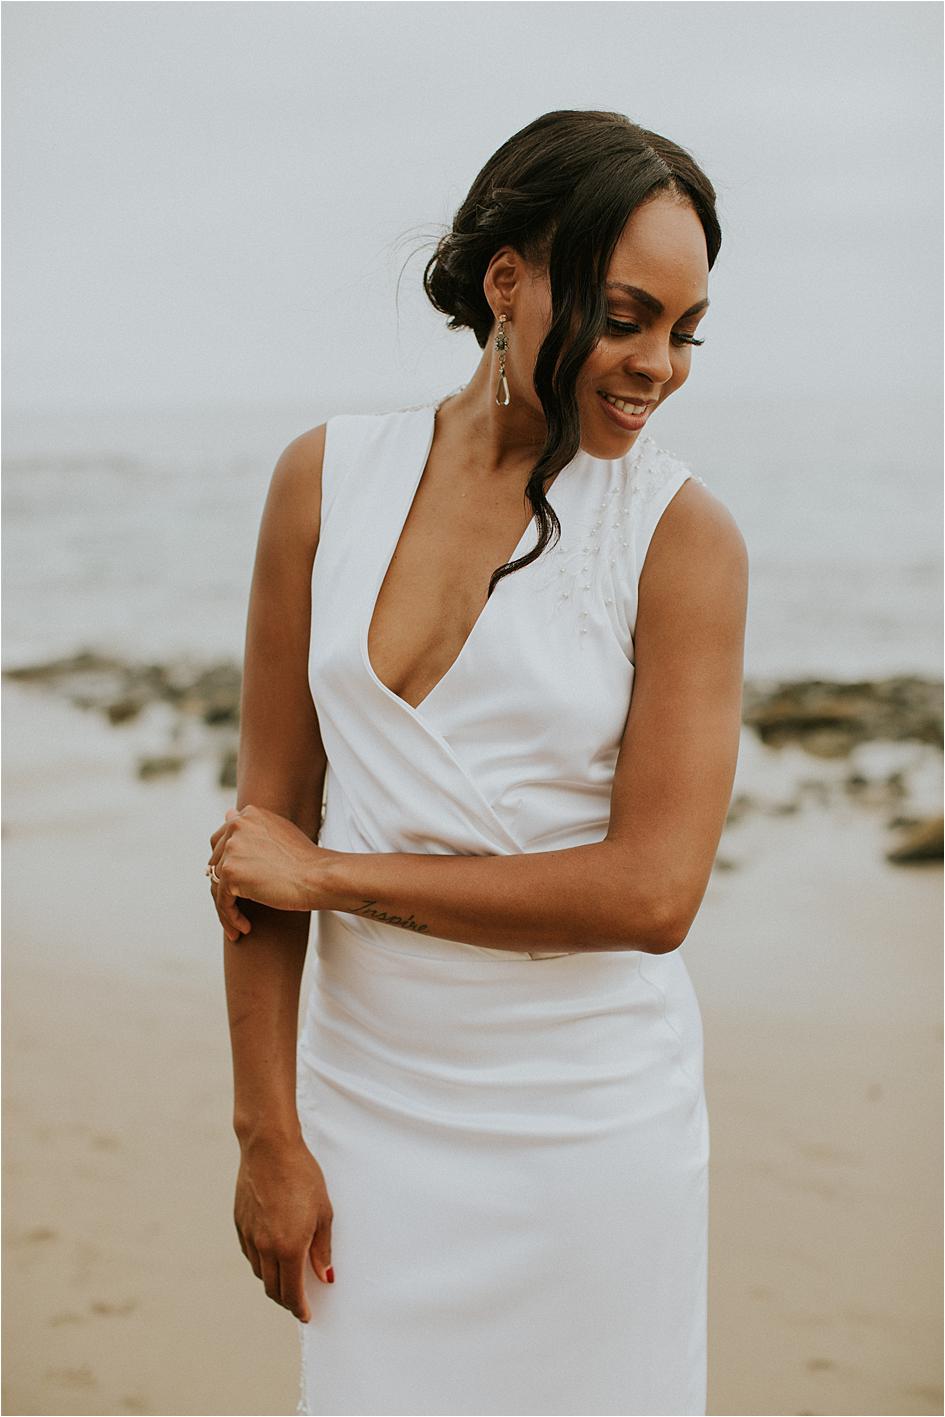 california wedding day, wedding photography, wedding inspiration, anniversary, wedding anniversary, anniversary photoshoot